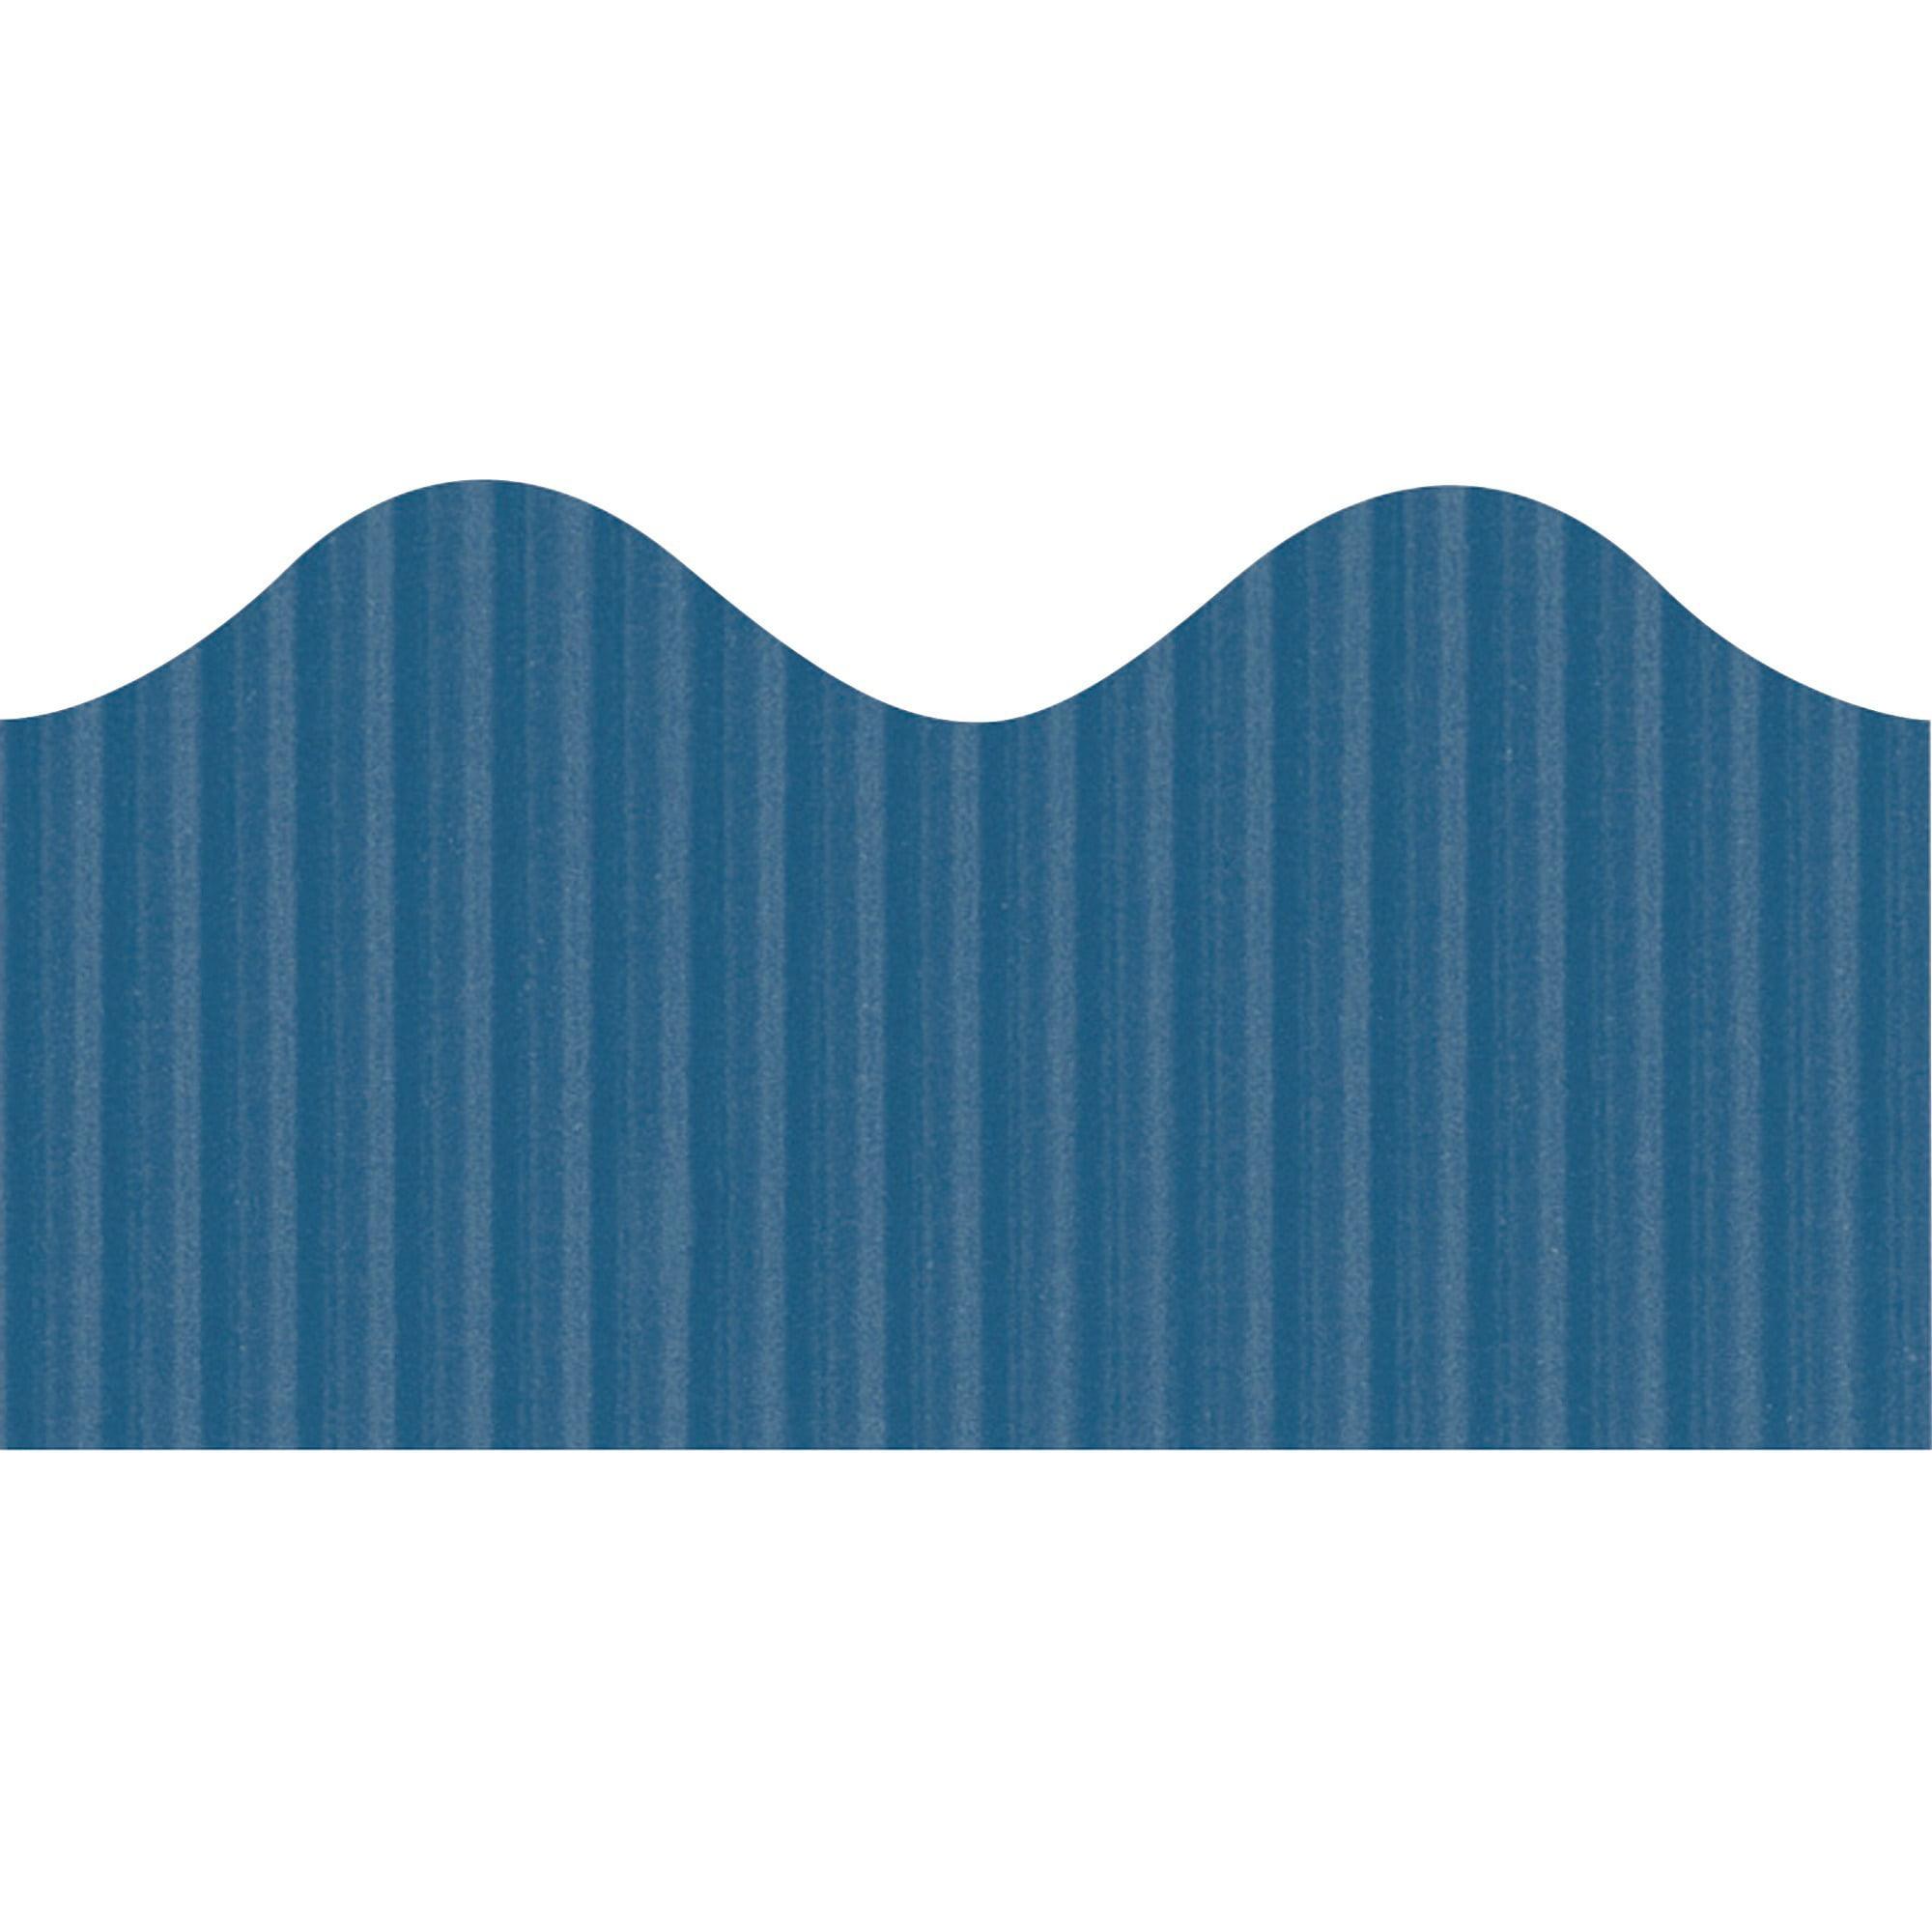 Bordette, PAC37184, Decorative Border, 1 / Roll, Rich Blue